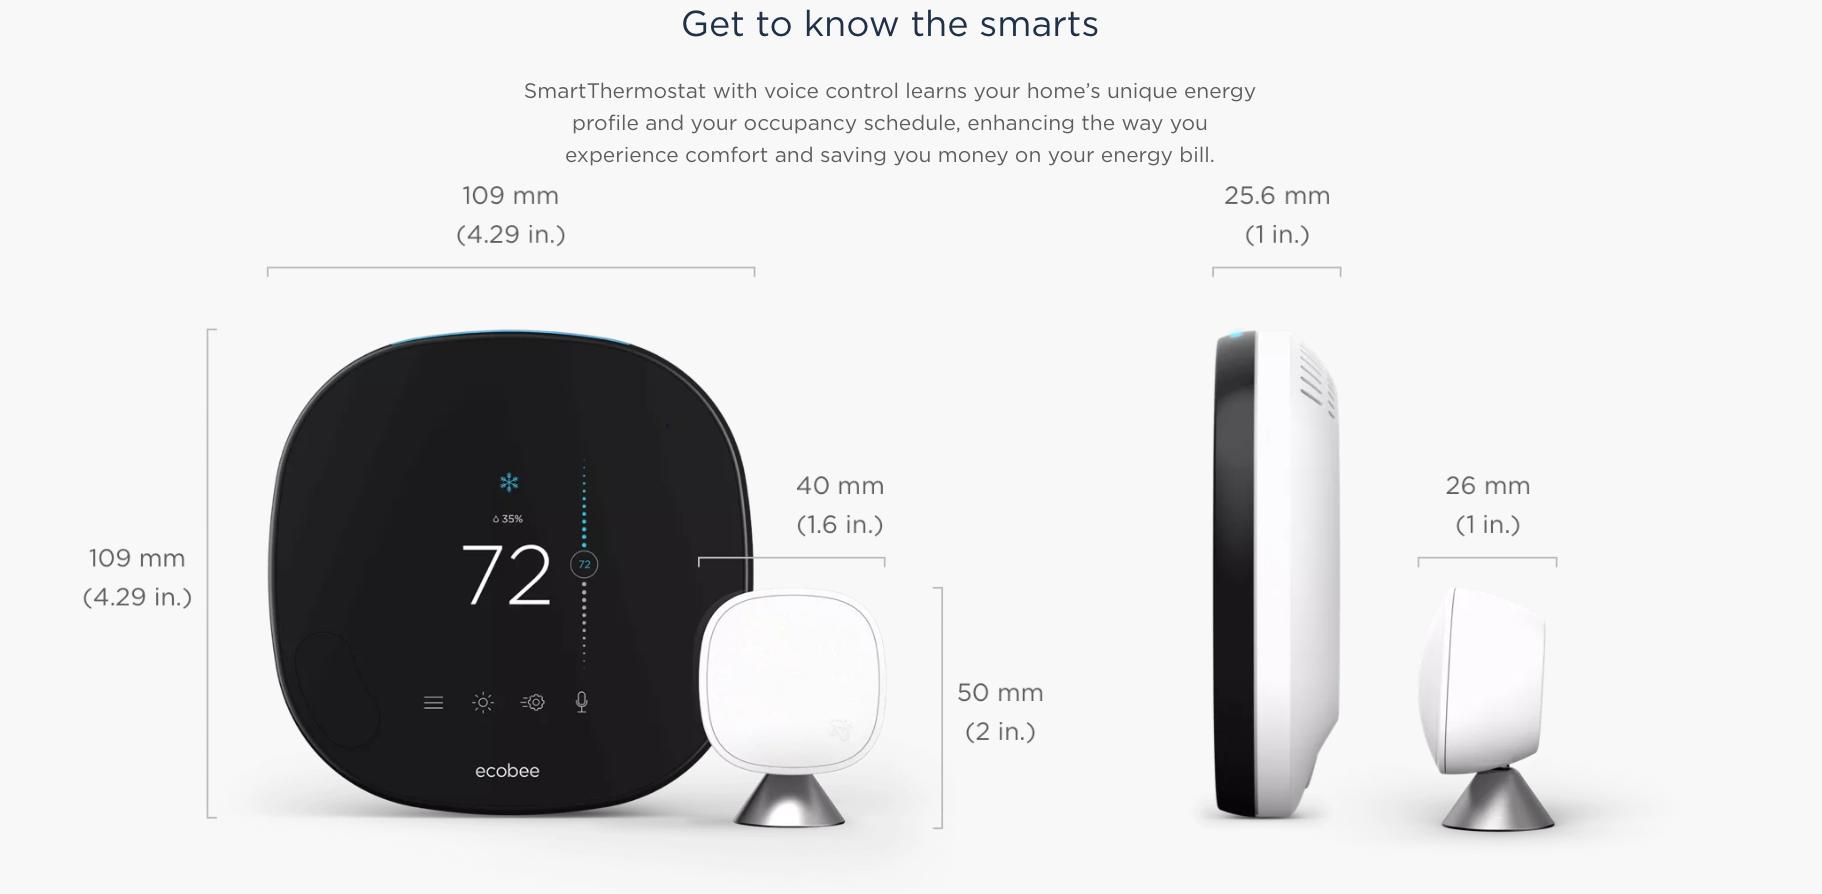 ecobee SmartThermostat Sizing Specs